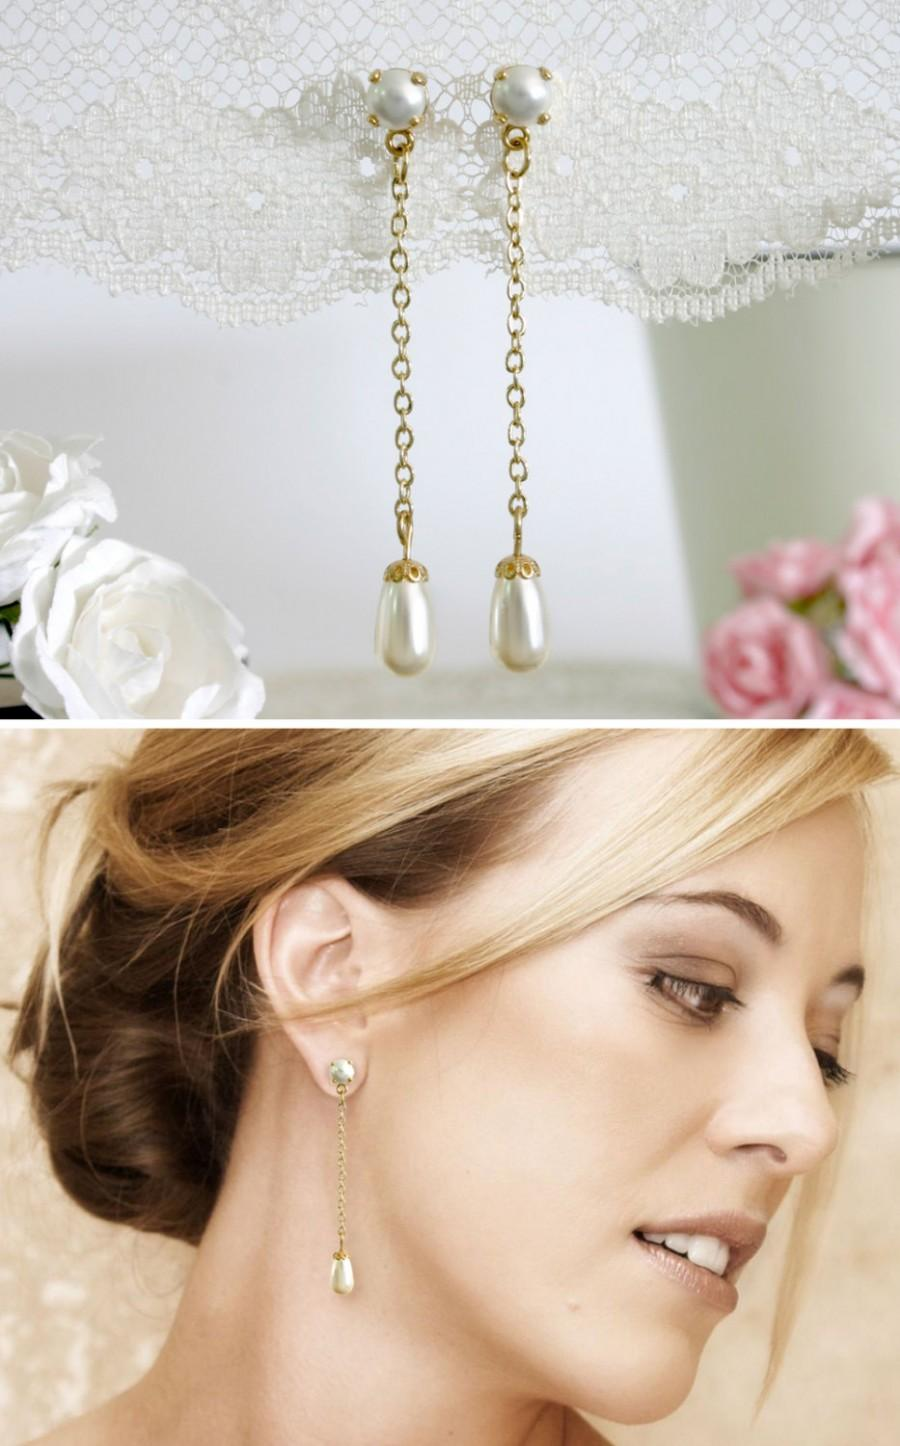 زفاف - Bridal pearl earrings, Pearl bridal jewelry, Pearl bridal earrings, Pearl wedding earrings, Long pearl earrings, Pearl drop earrings